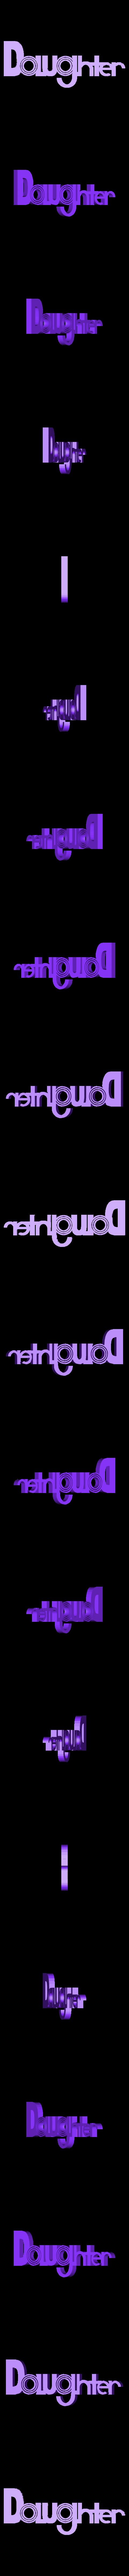 daughter_gimbal.stl Download free STL file Son and Daughter Gimbals • 3D print template, sh0rt_stak